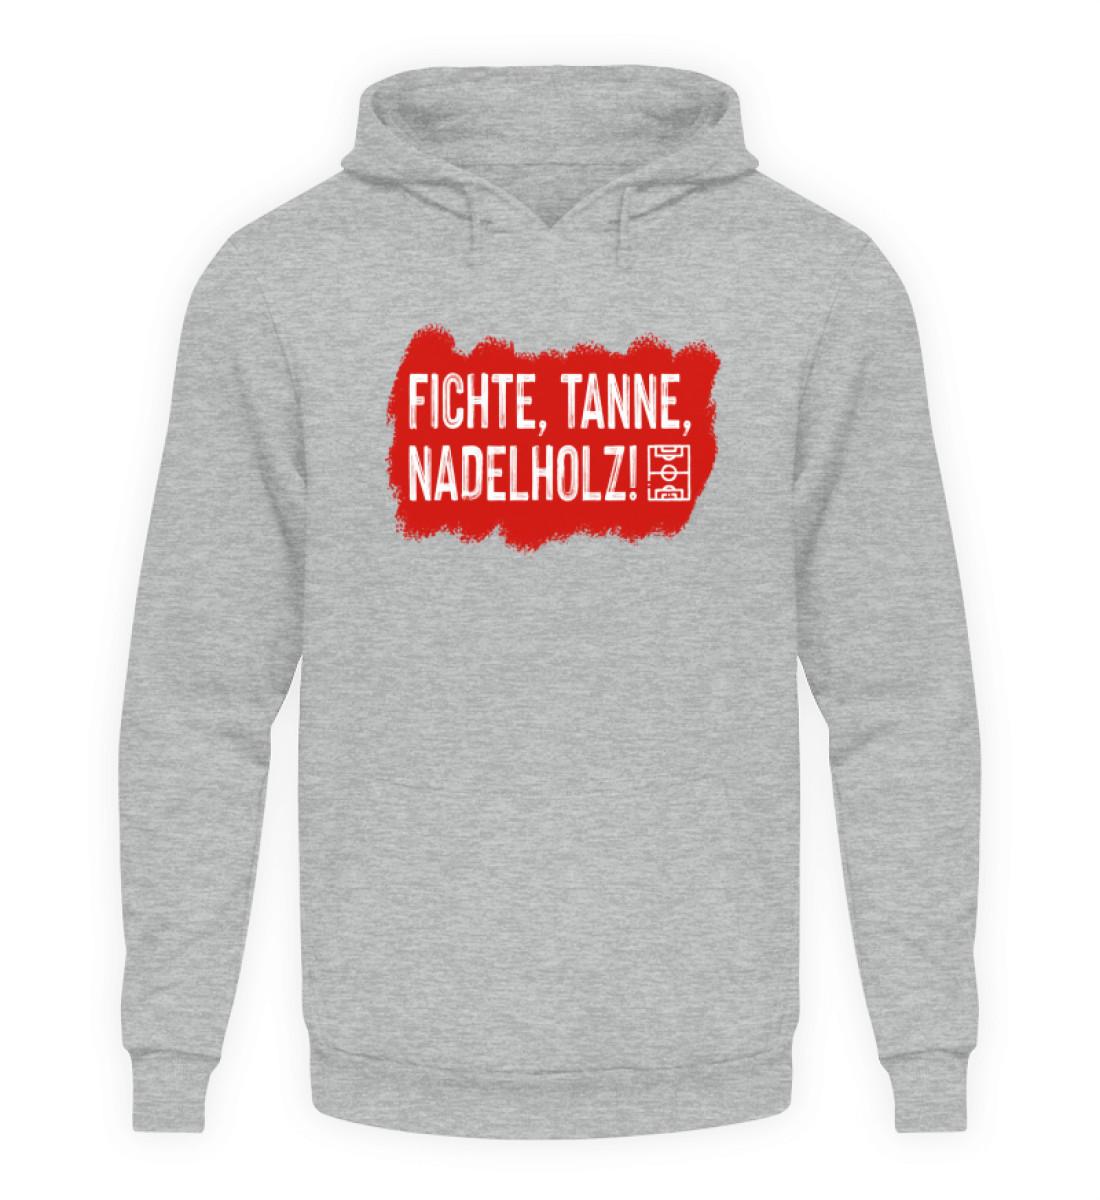 Fichte, Tanne, Nadelholz - Unisex Kapuzenpullover Hoodie-6807